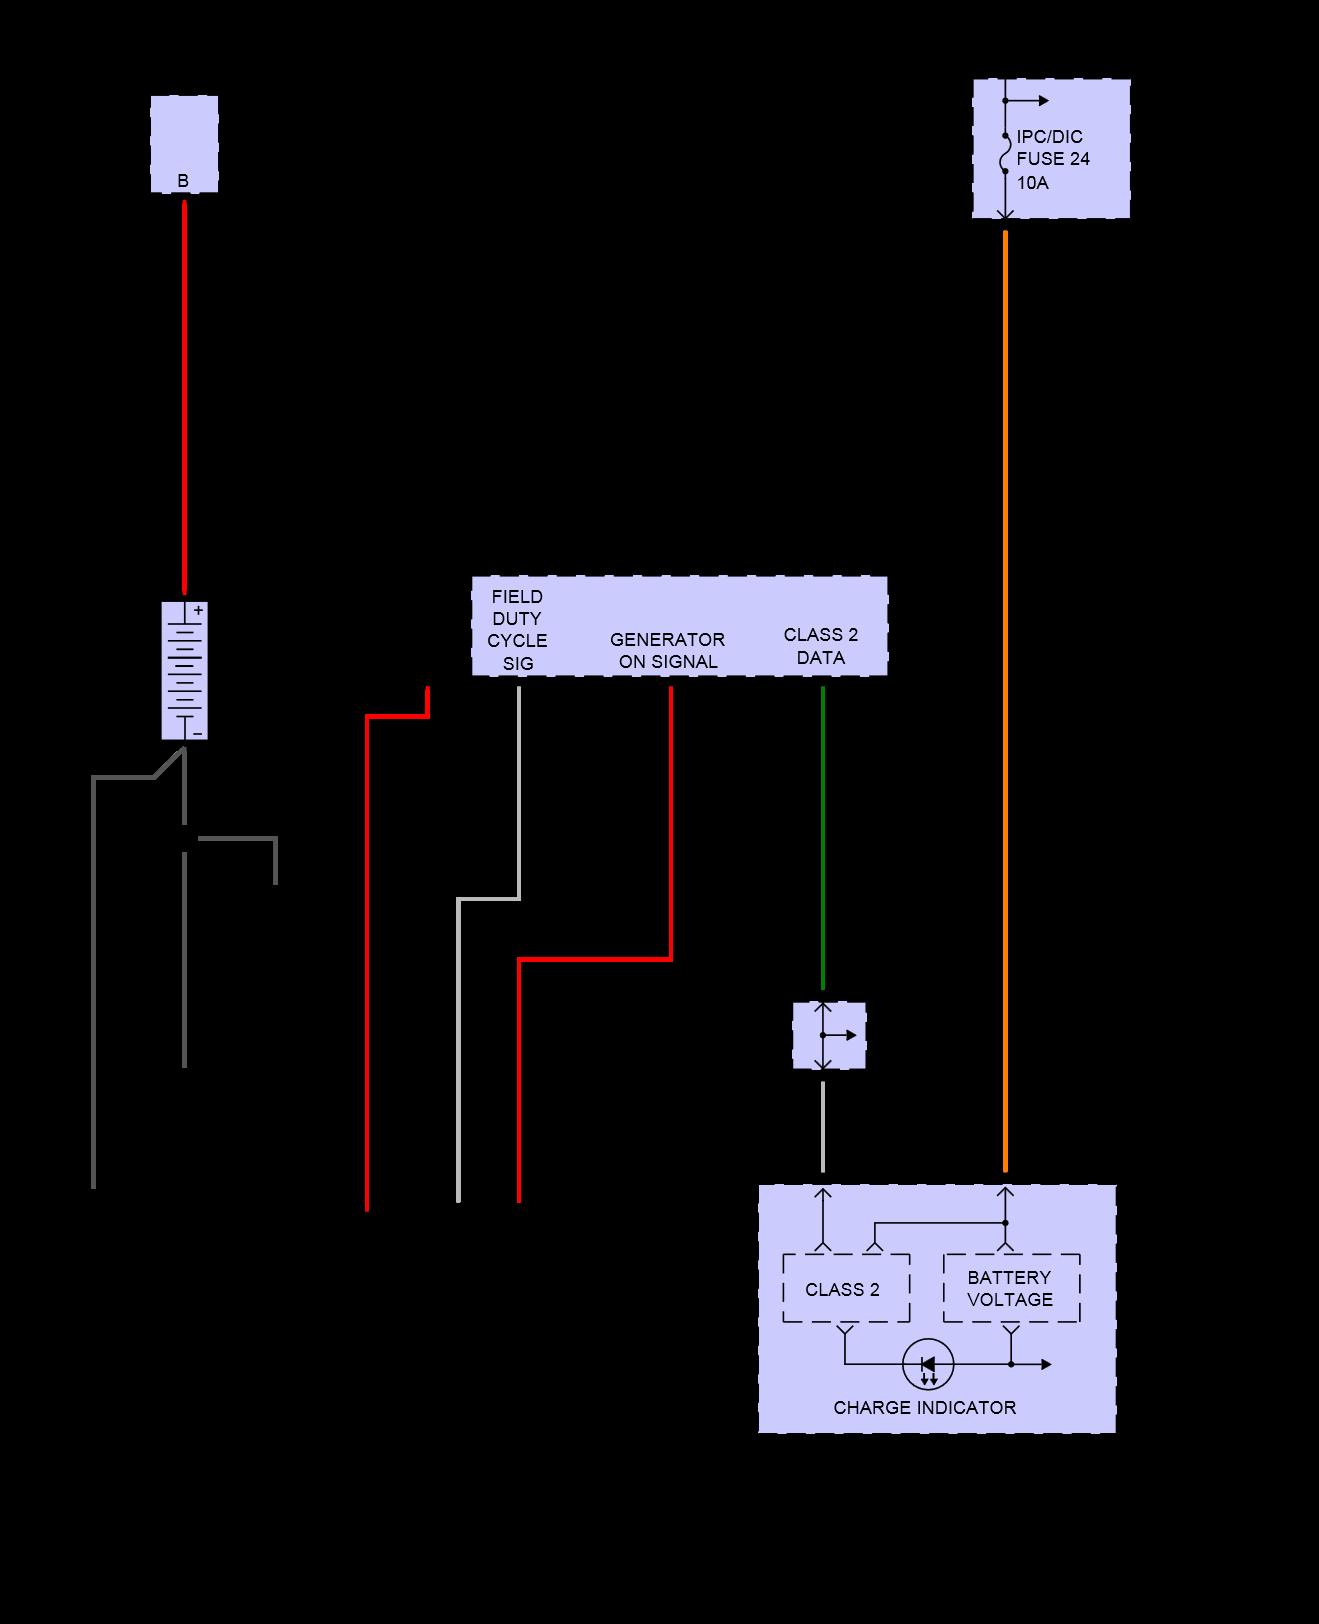 2002 chevrolet trailblazer wiring harness kf 9825  2003 chevy trailblazer wiring schematic schematic wiring  2003 chevy trailblazer wiring schematic